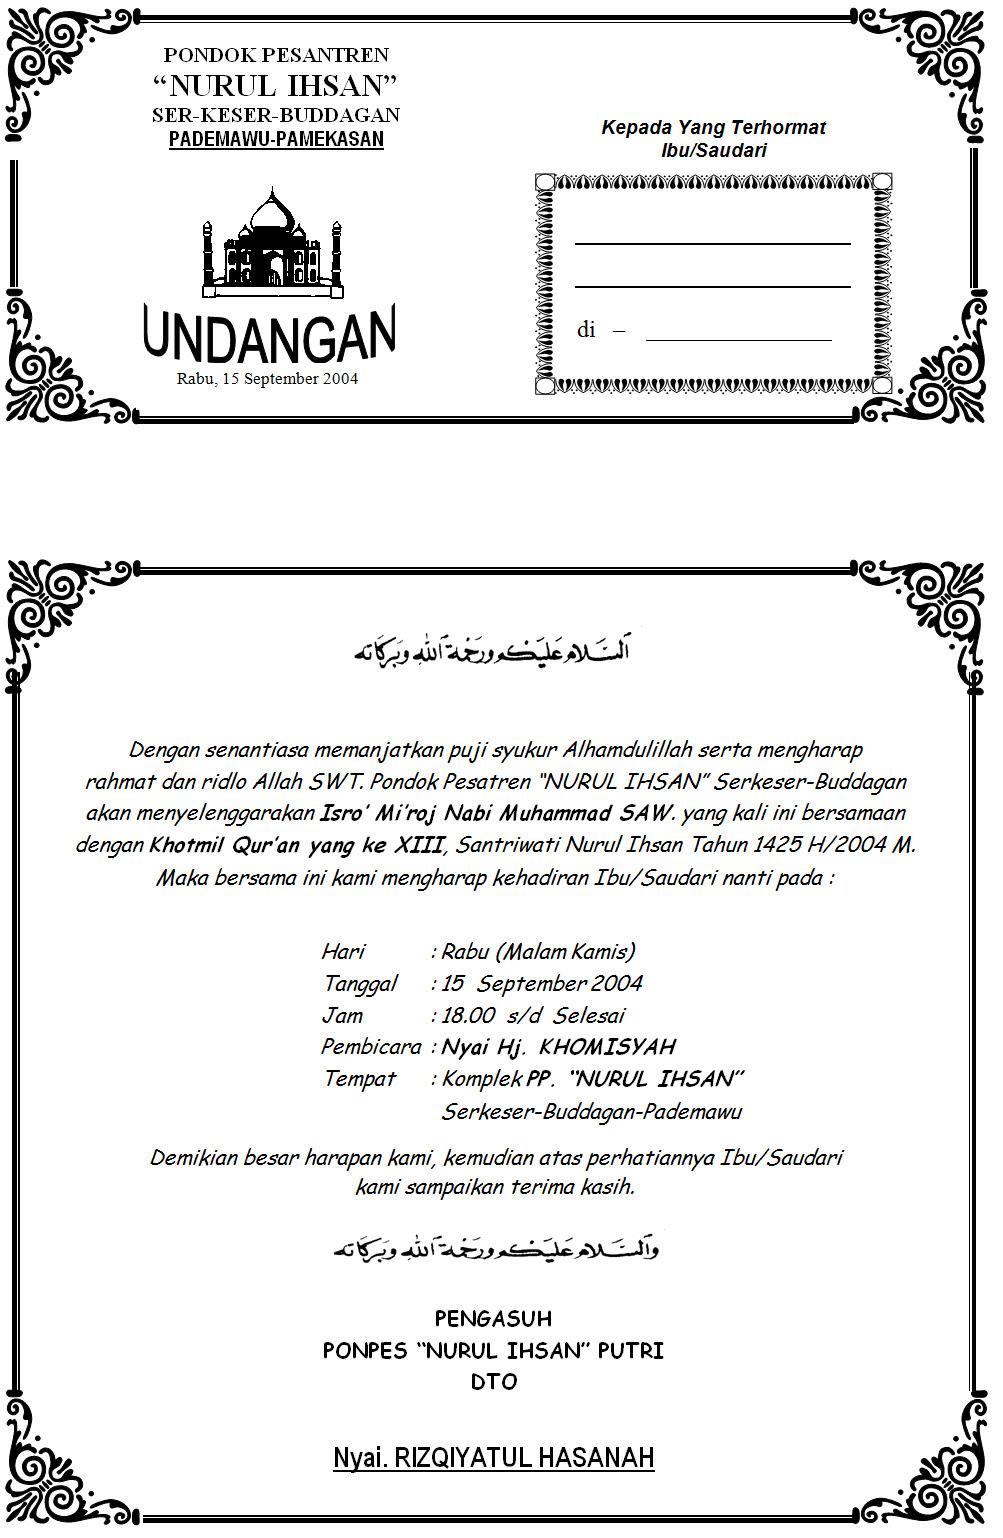 contoh template undangan pengajian contoh isi undangan